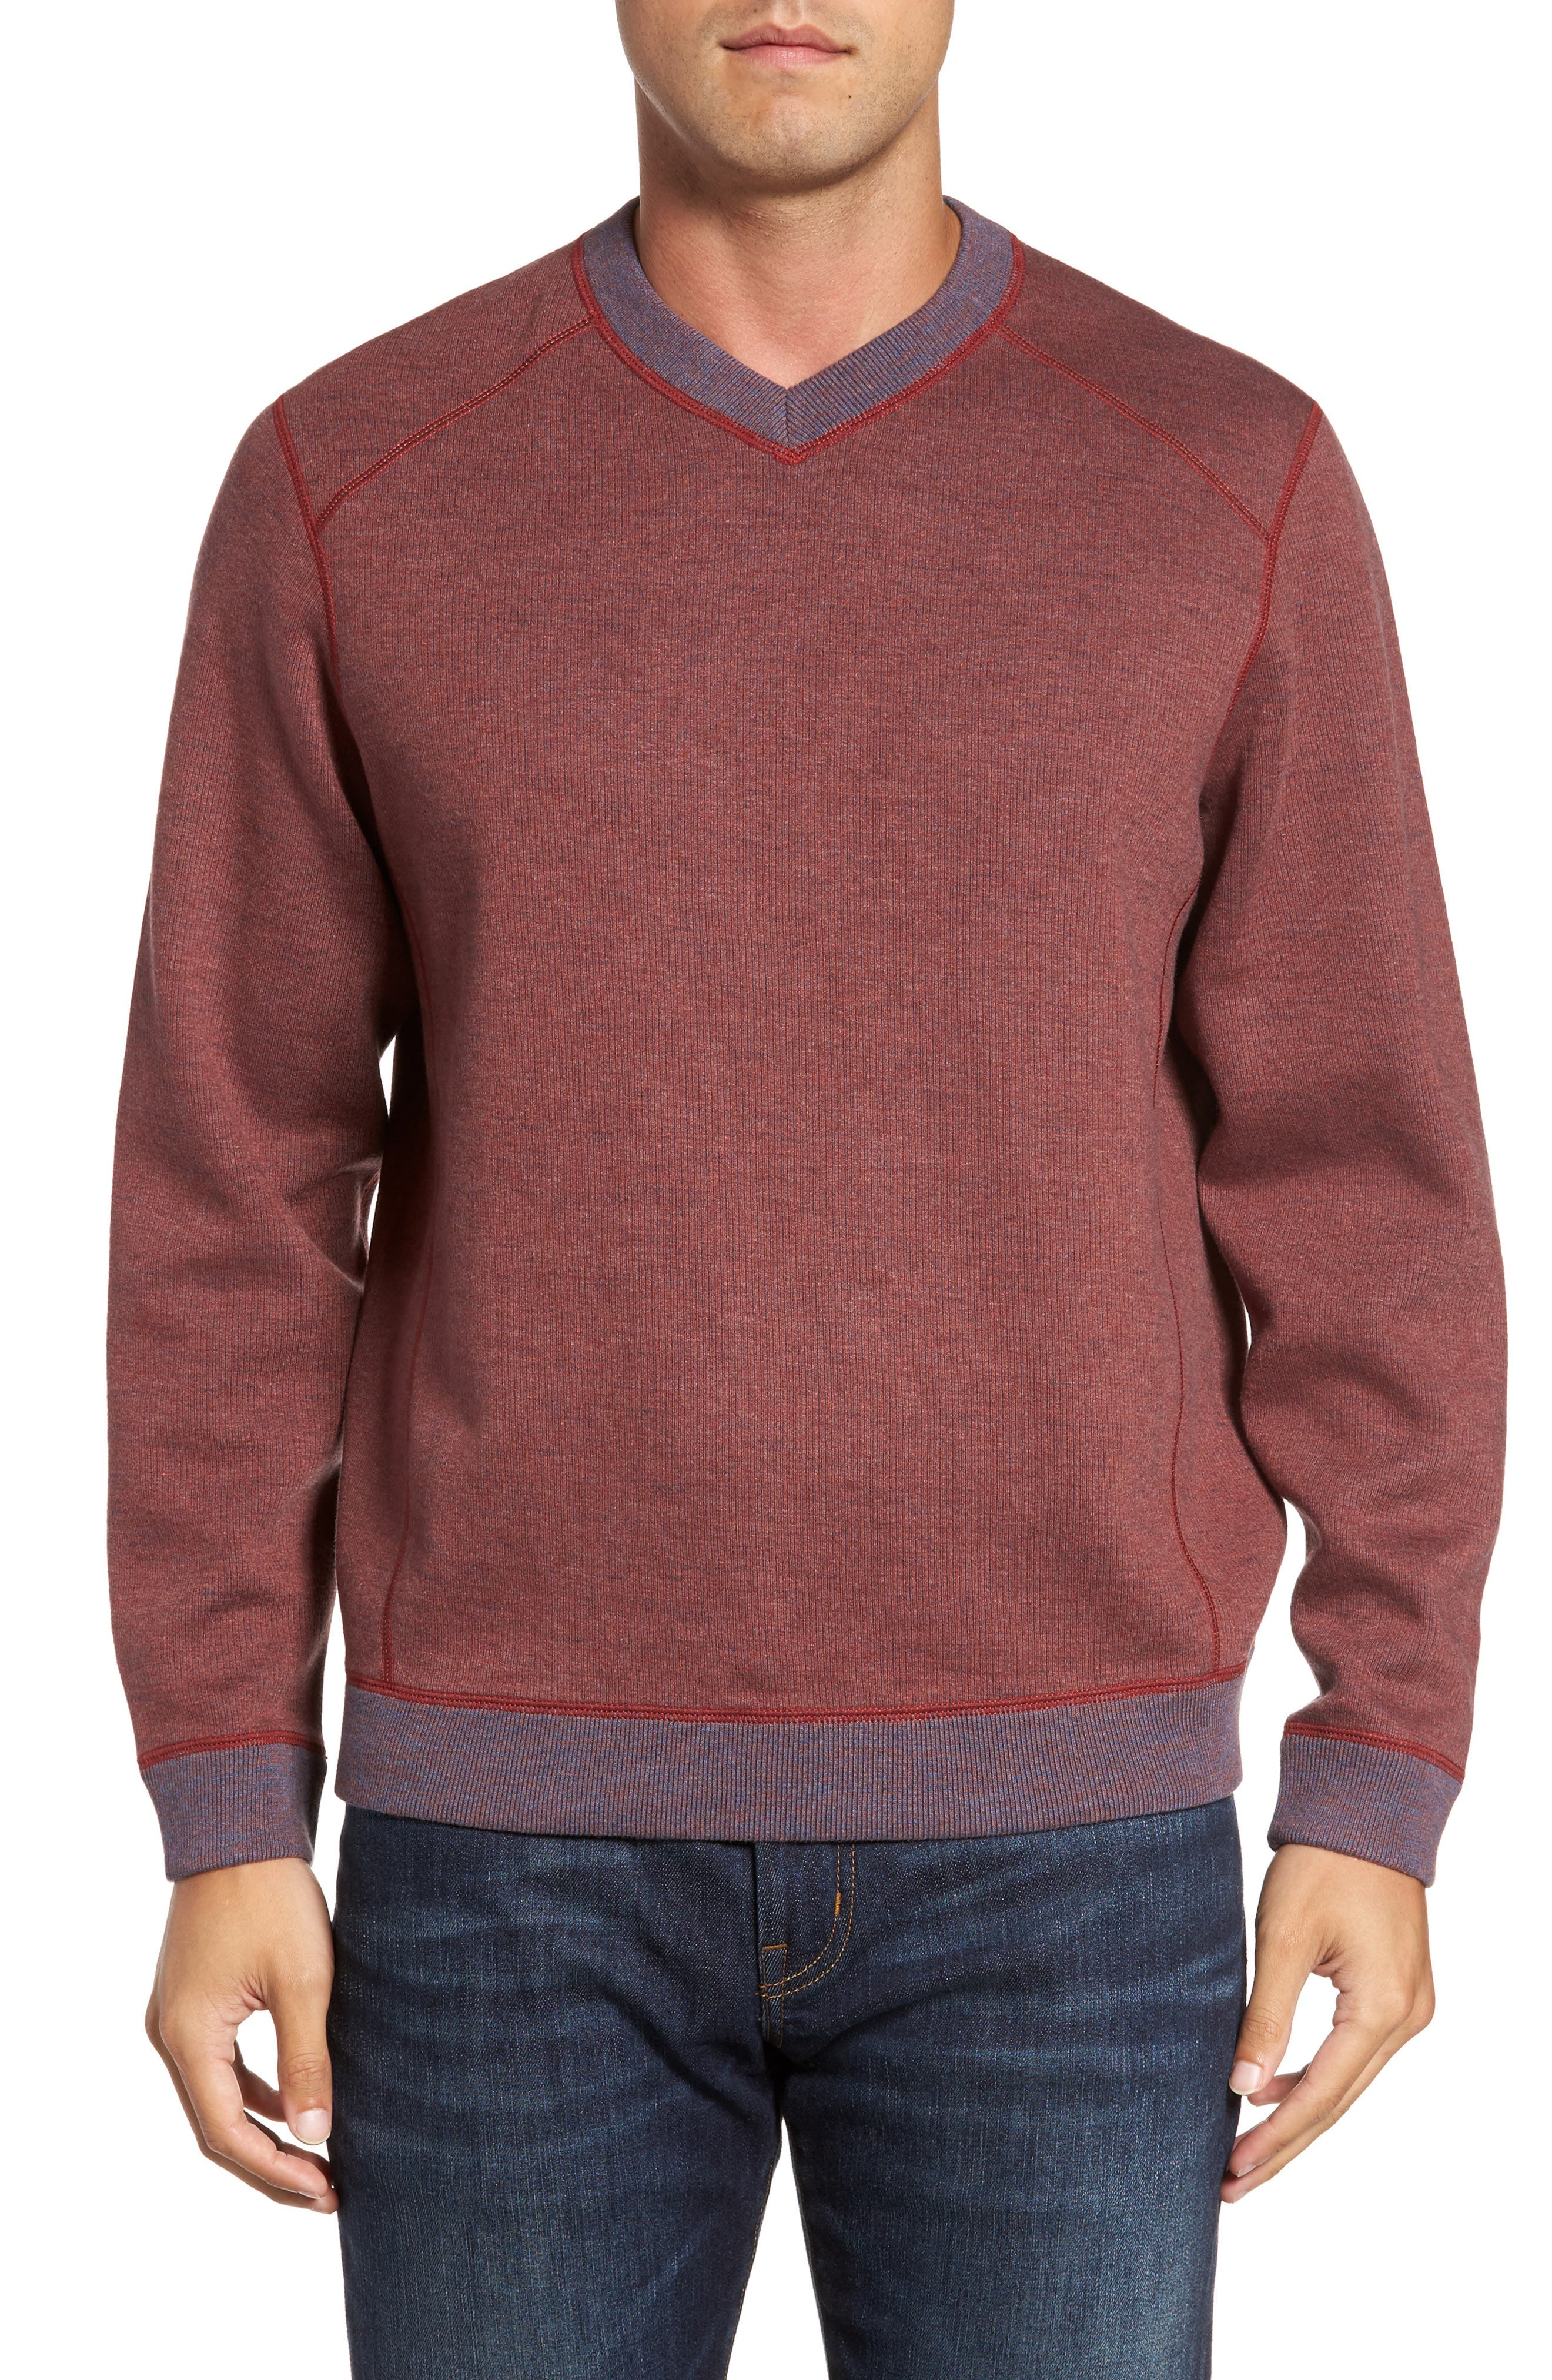 Flipside Pro Reversible Sweatshirt,                             Main thumbnail 1, color,                             Pompeya Heather